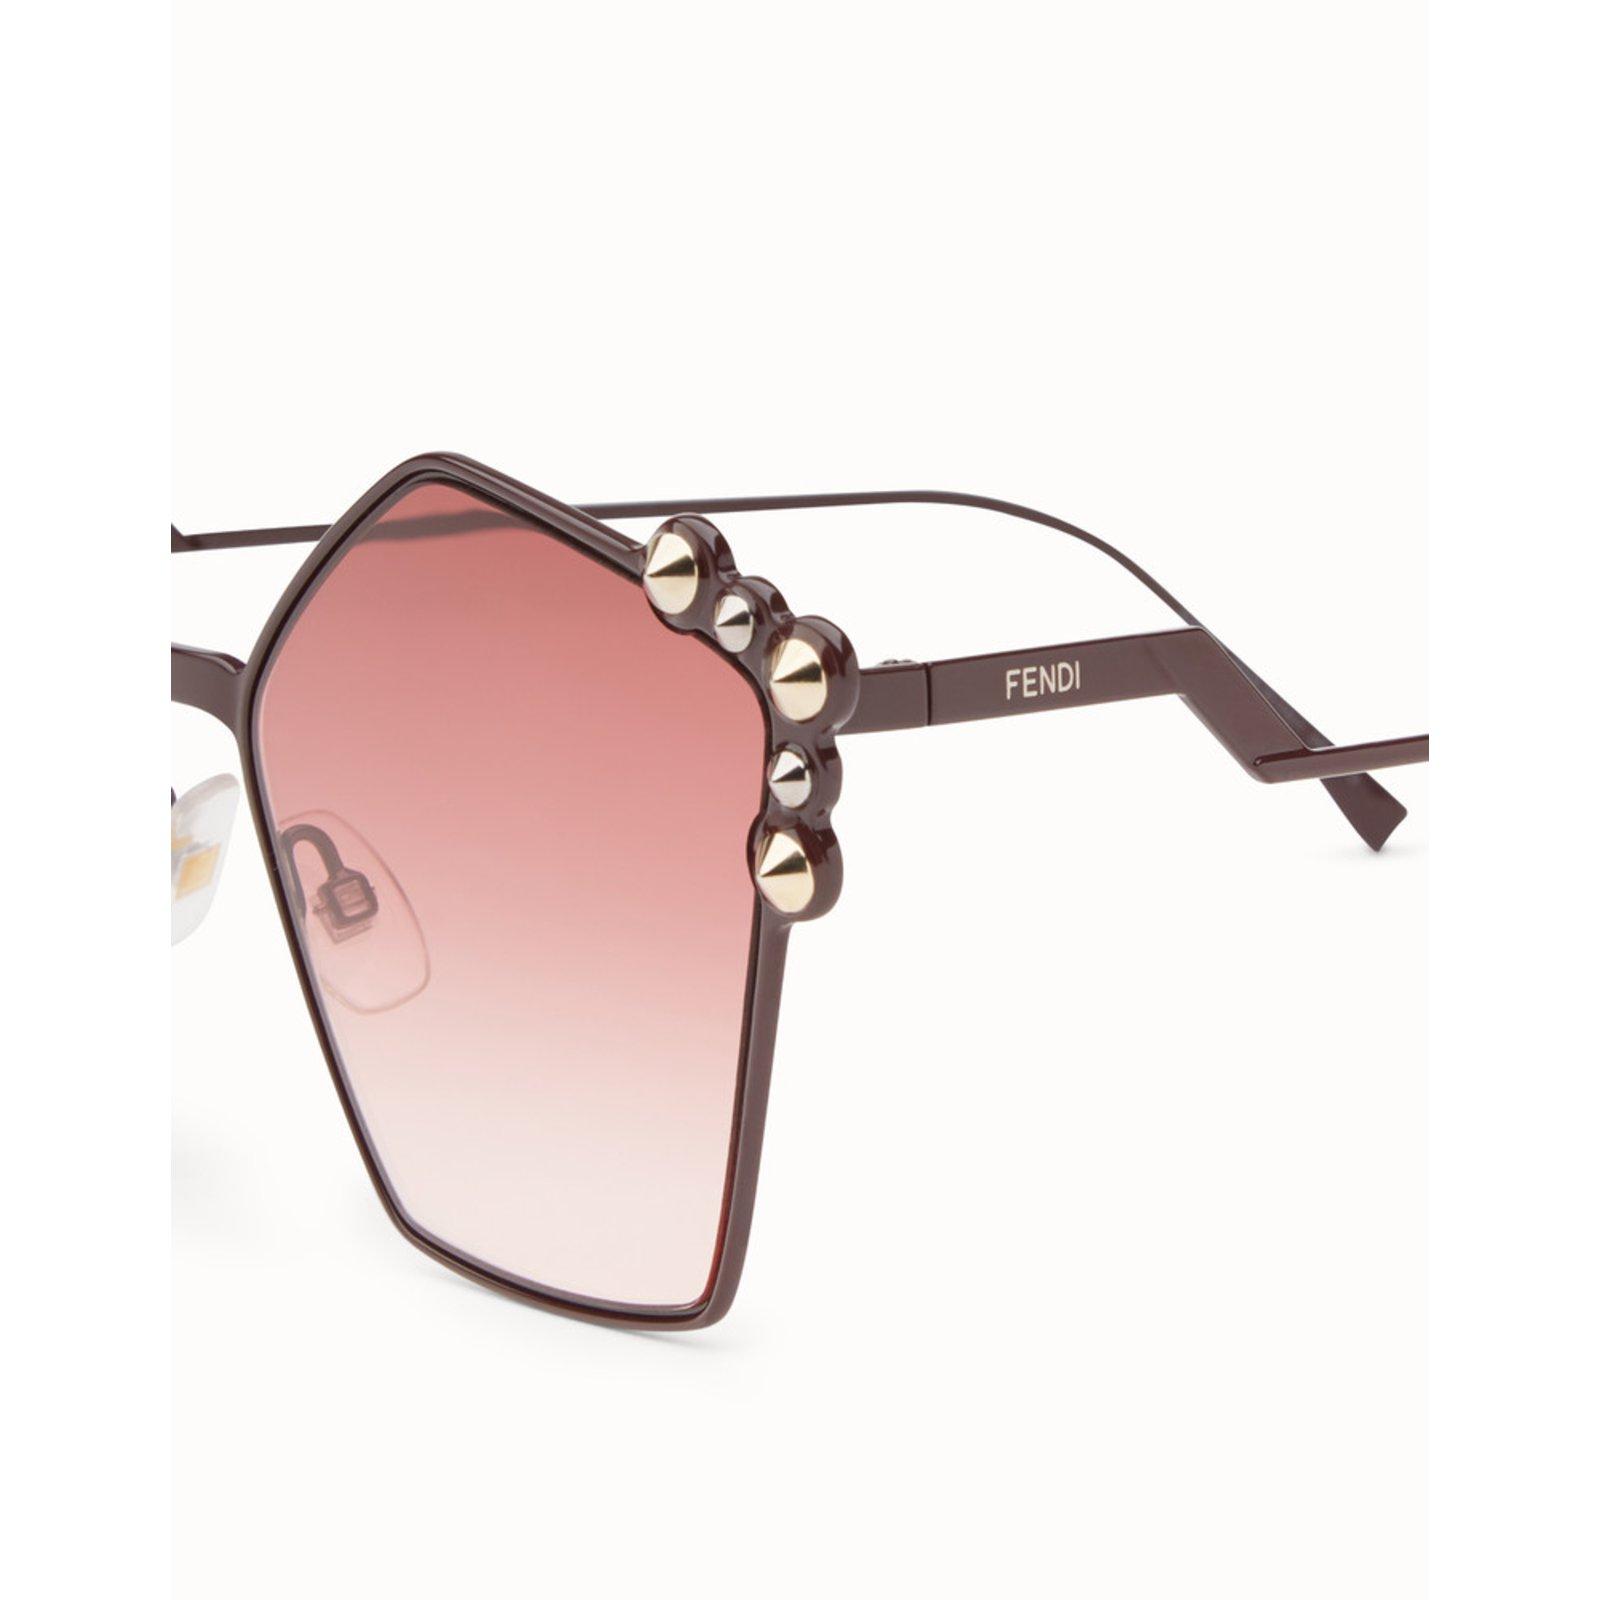 95f659e577 Fendi Sunglasses CAT EYE Purple new 2018 Sunglasses Metal Black